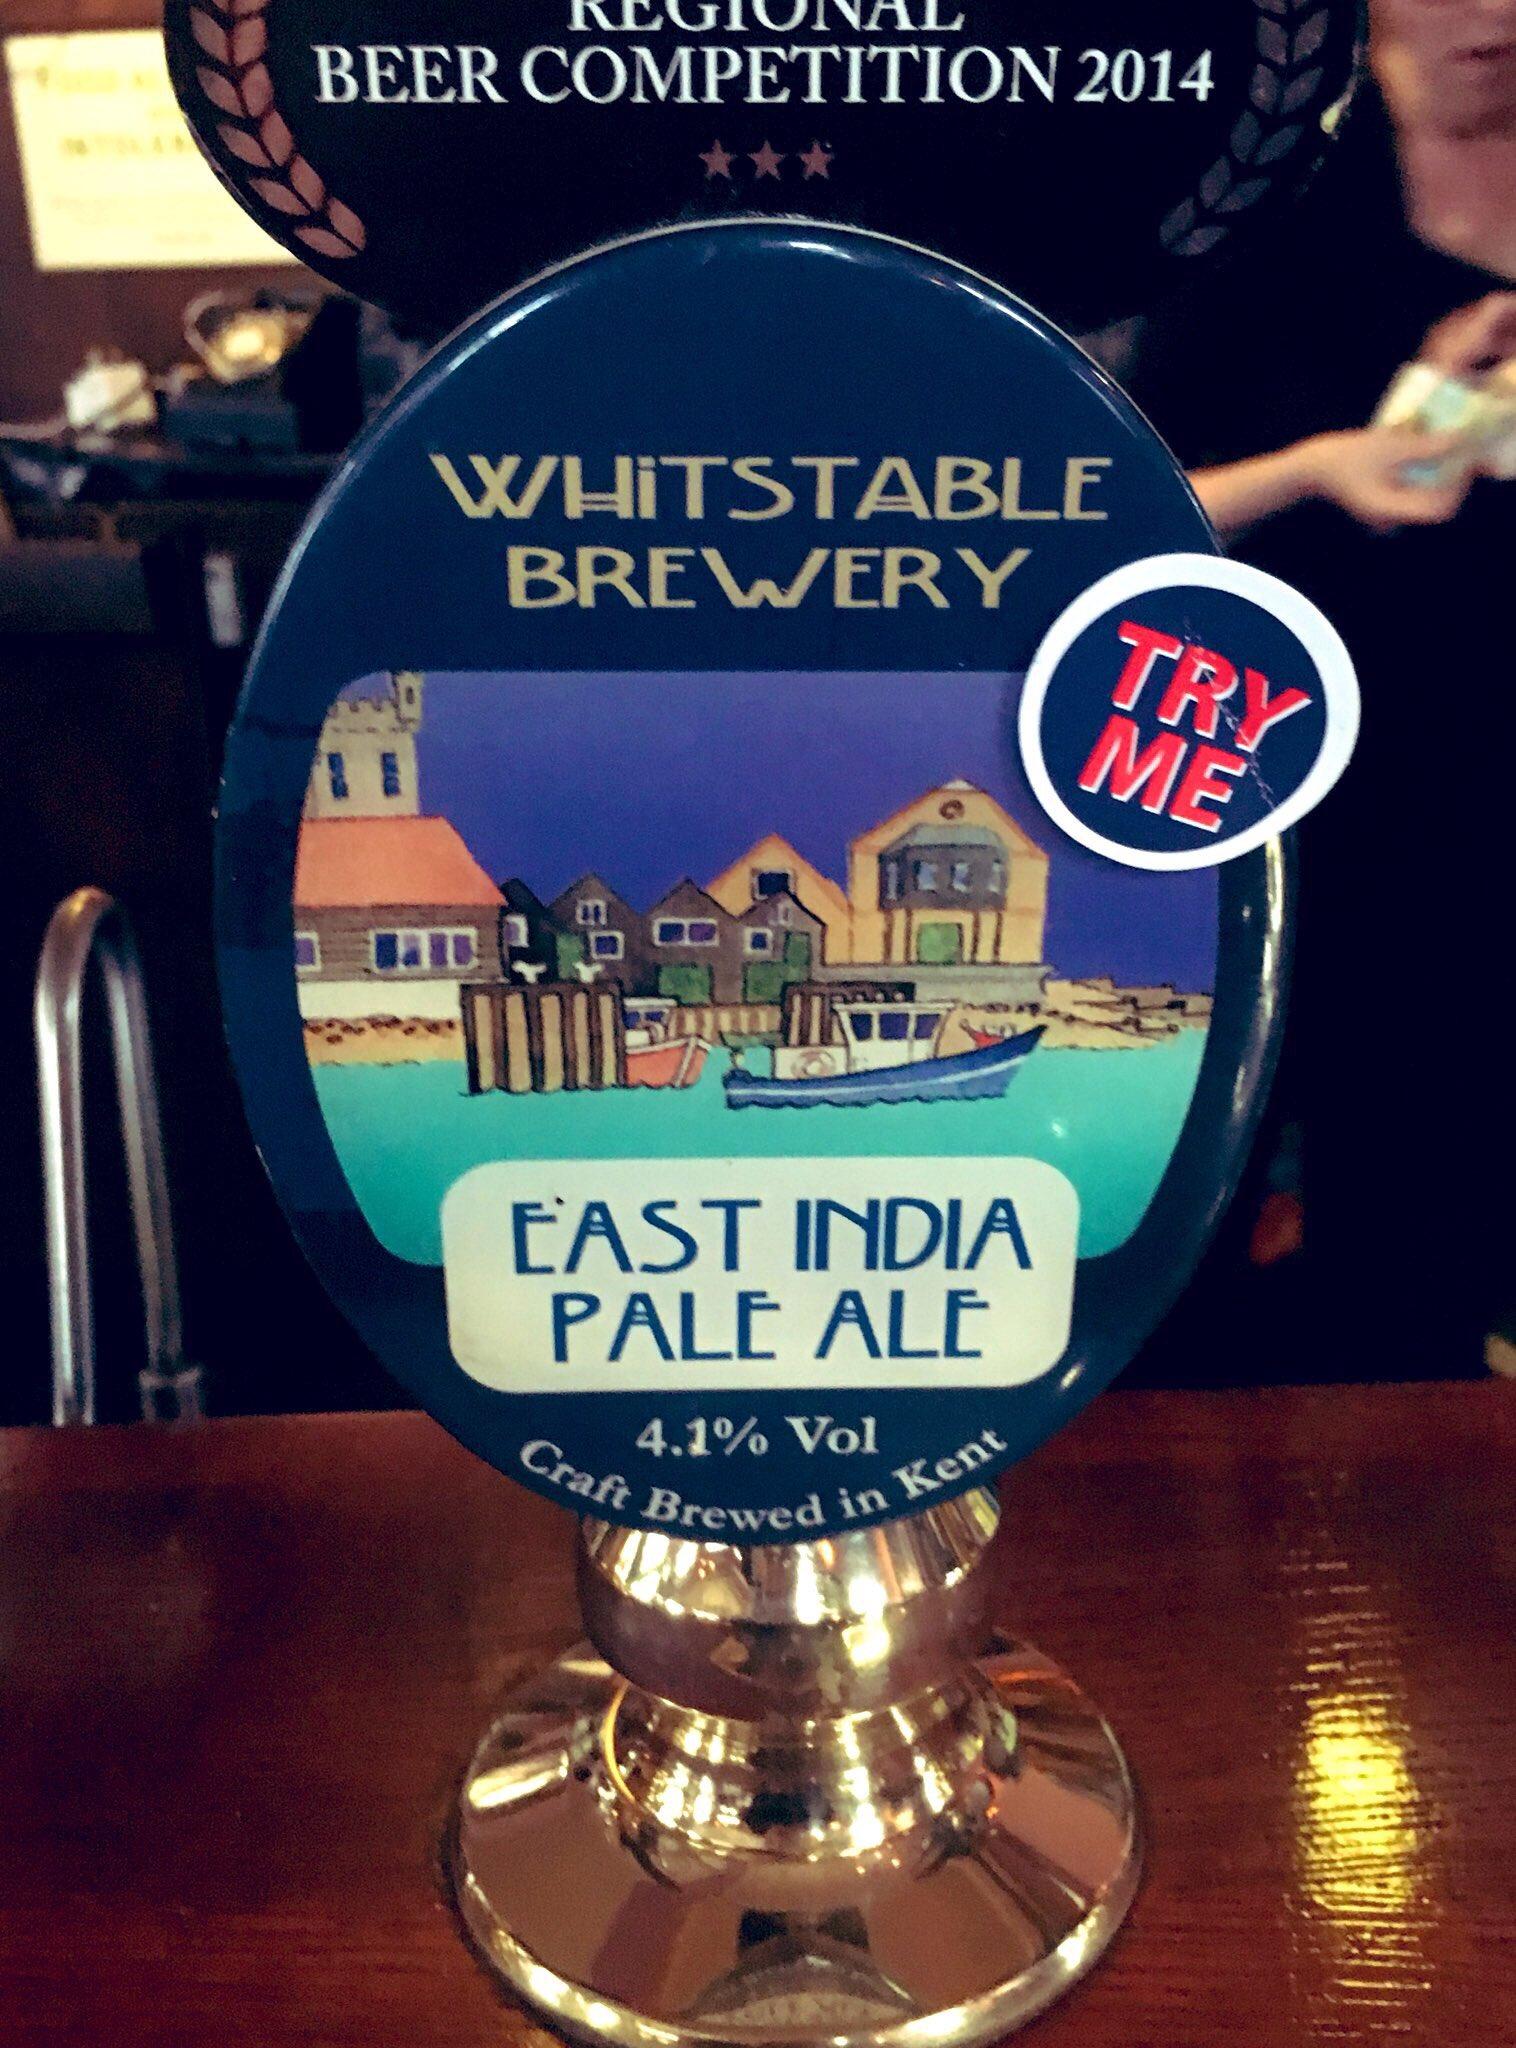 180: East India Pale Ale